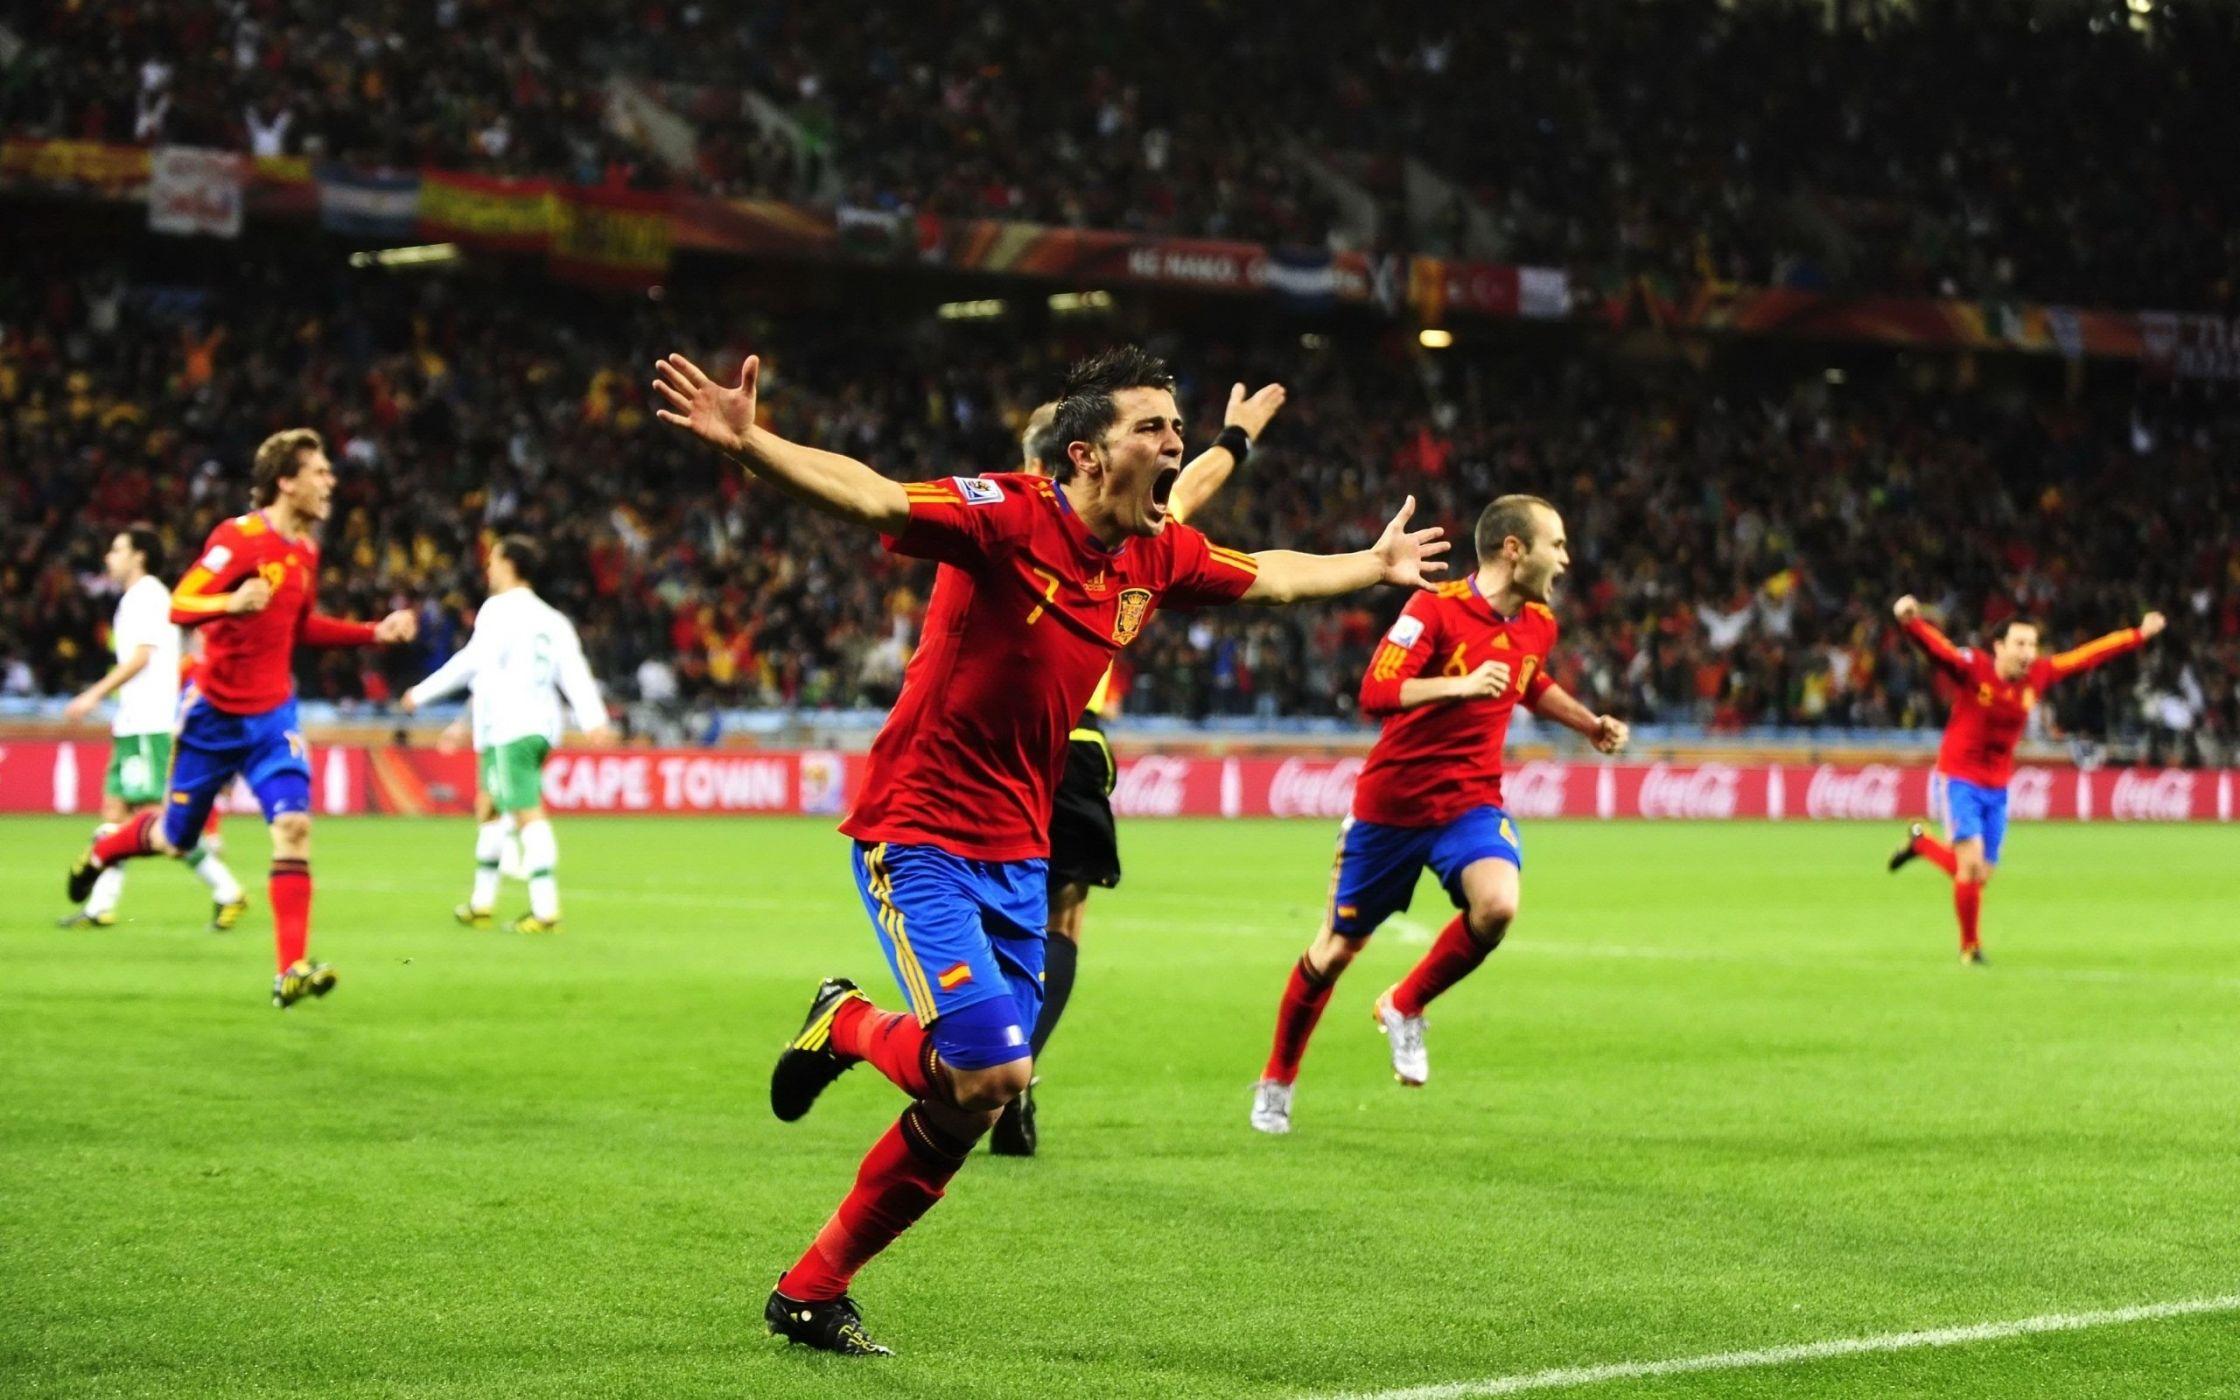 Casinoper İspanya Ligi Puan Durumu Nedir